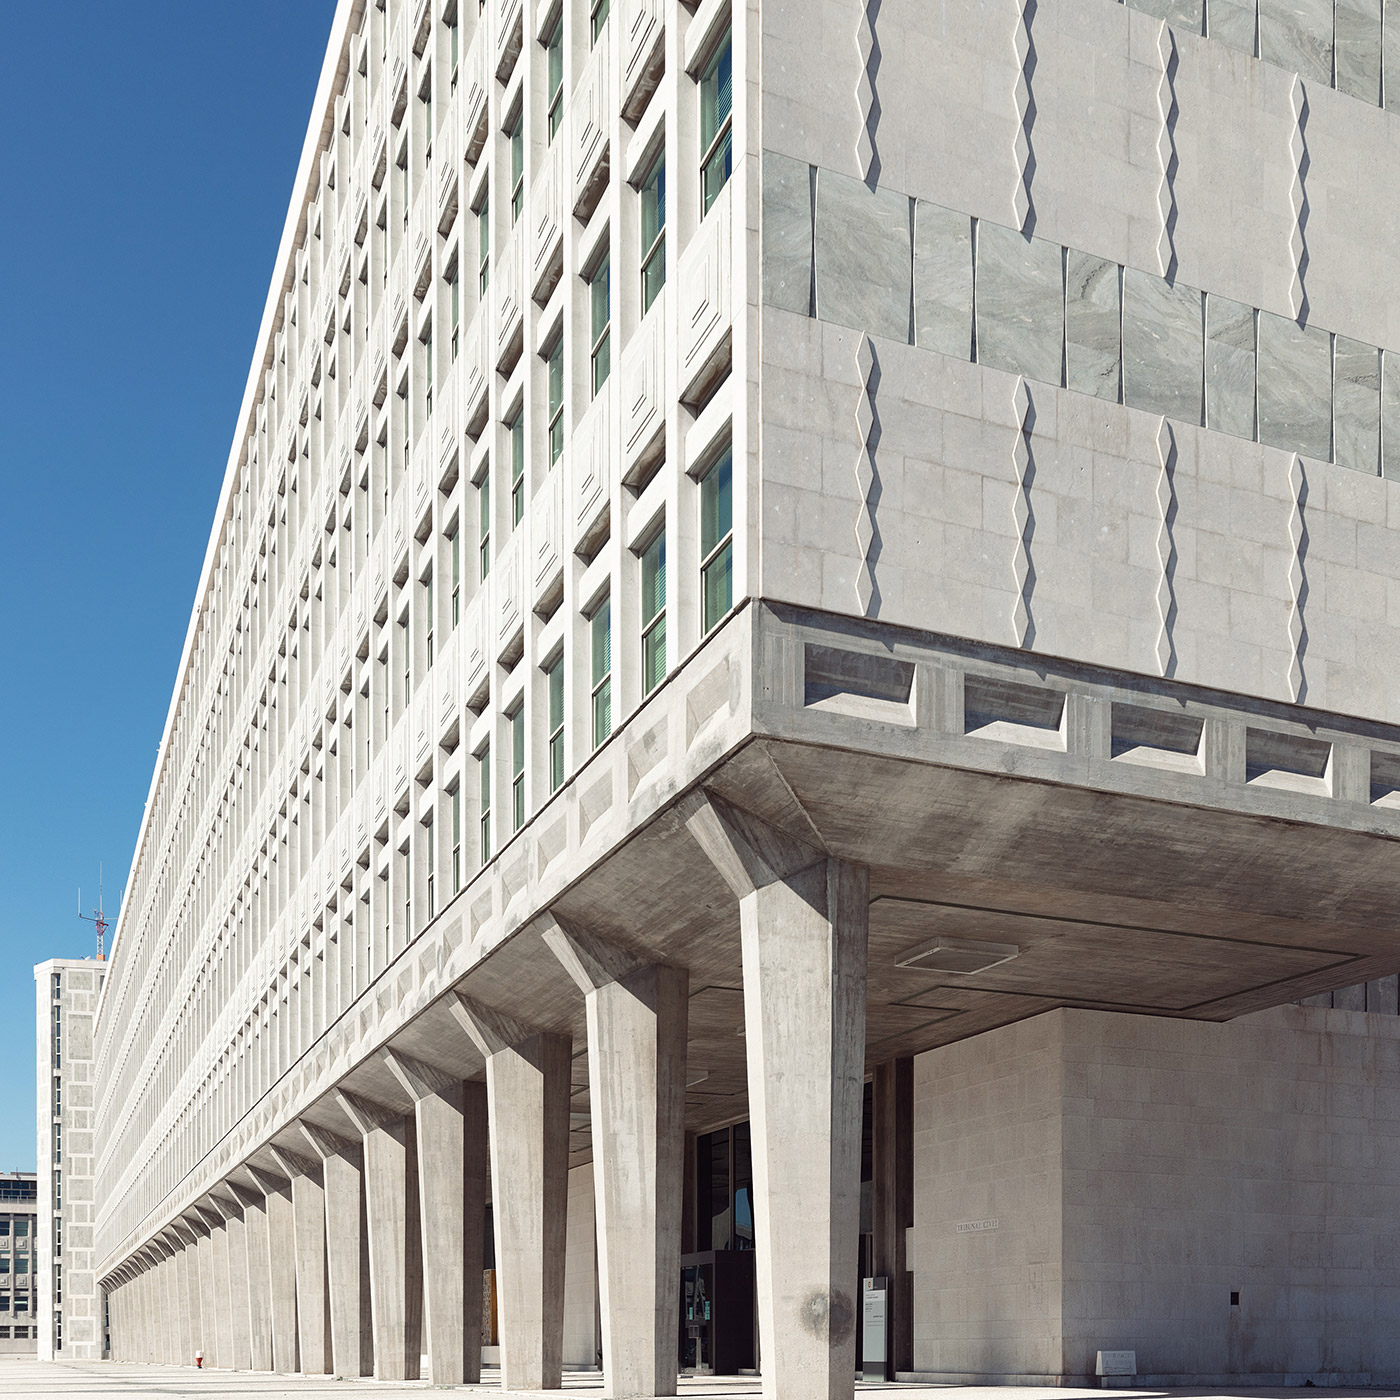 Palace of Justice . Location: Lisbon, Portugal . Architect: Januário Godinho, João Andresen